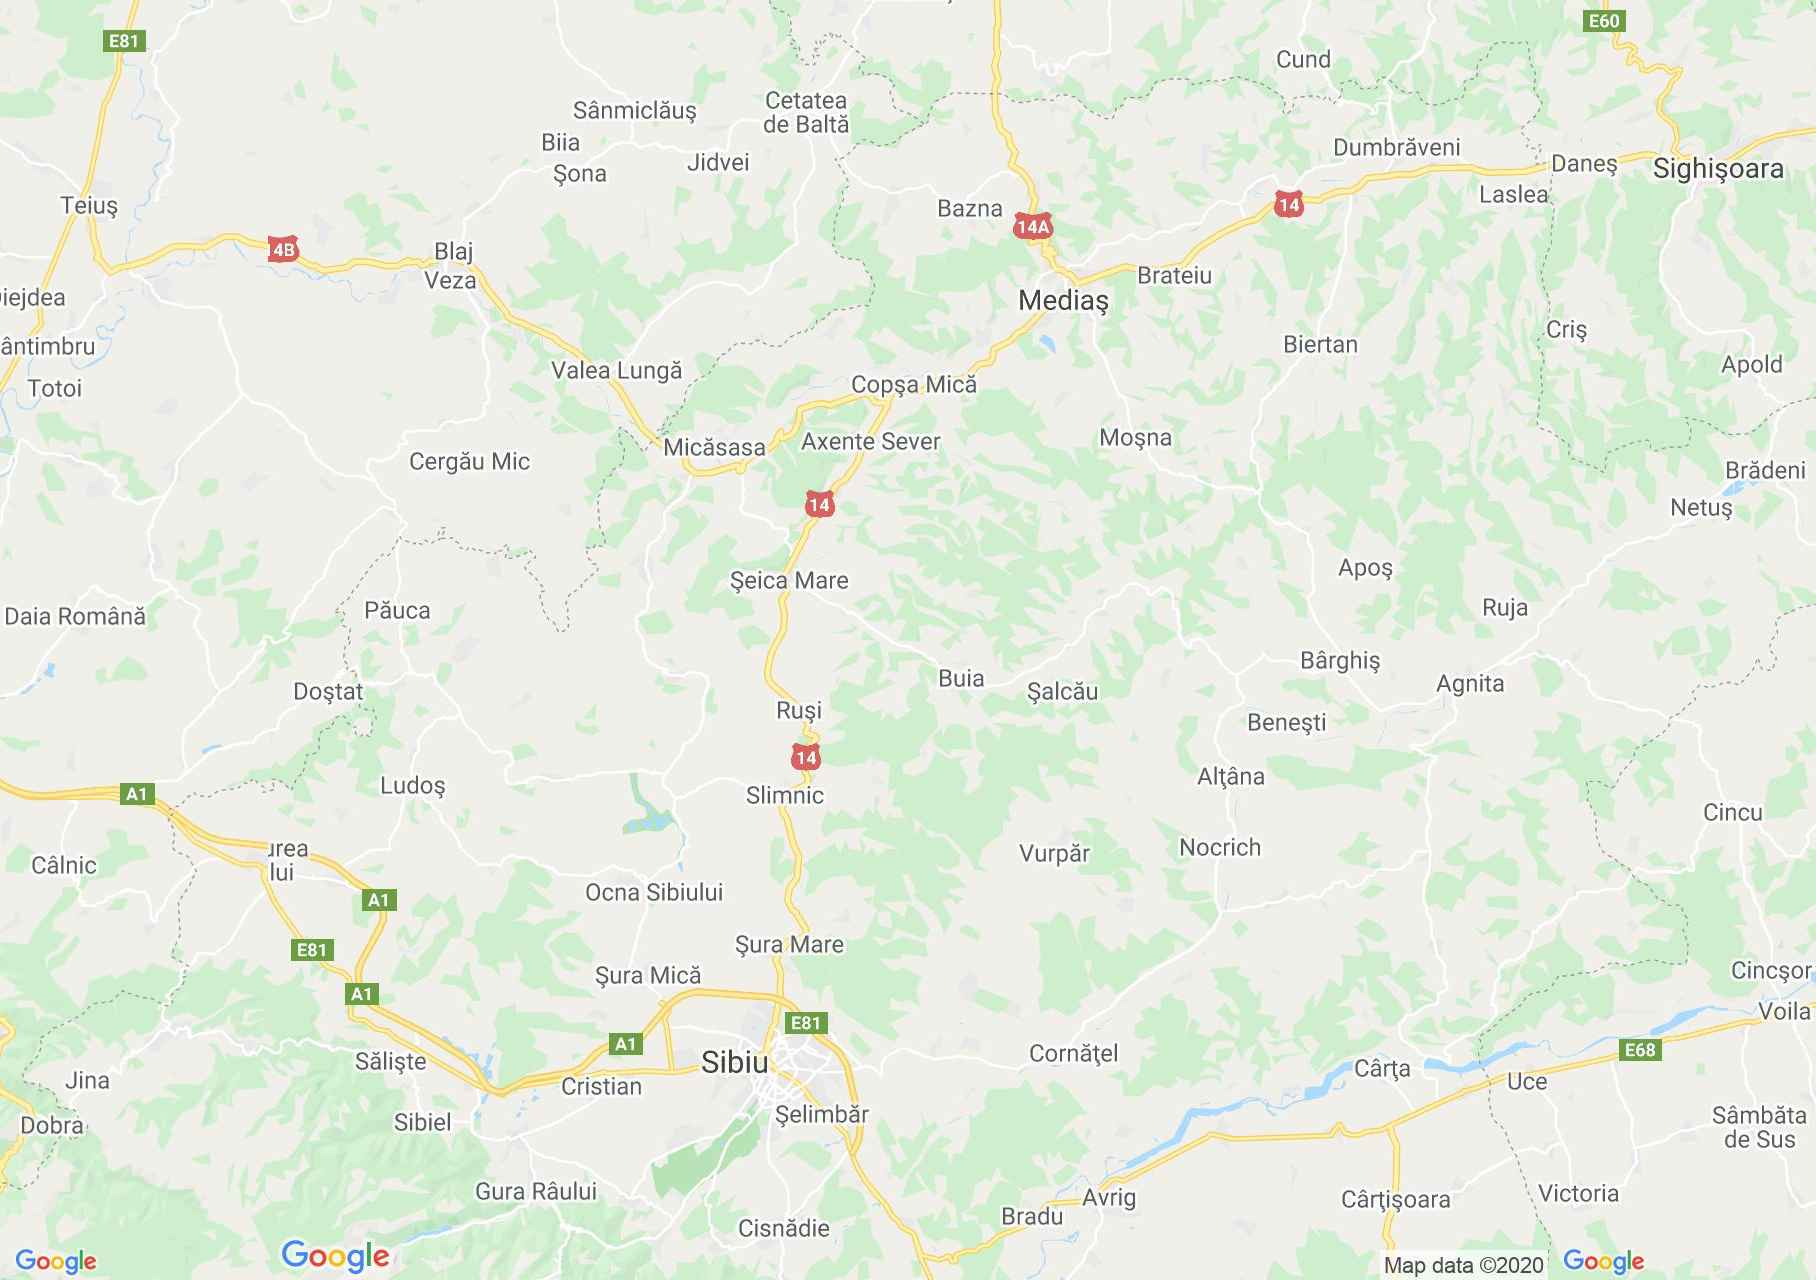 Interactive tourist map of Romania on Google Map